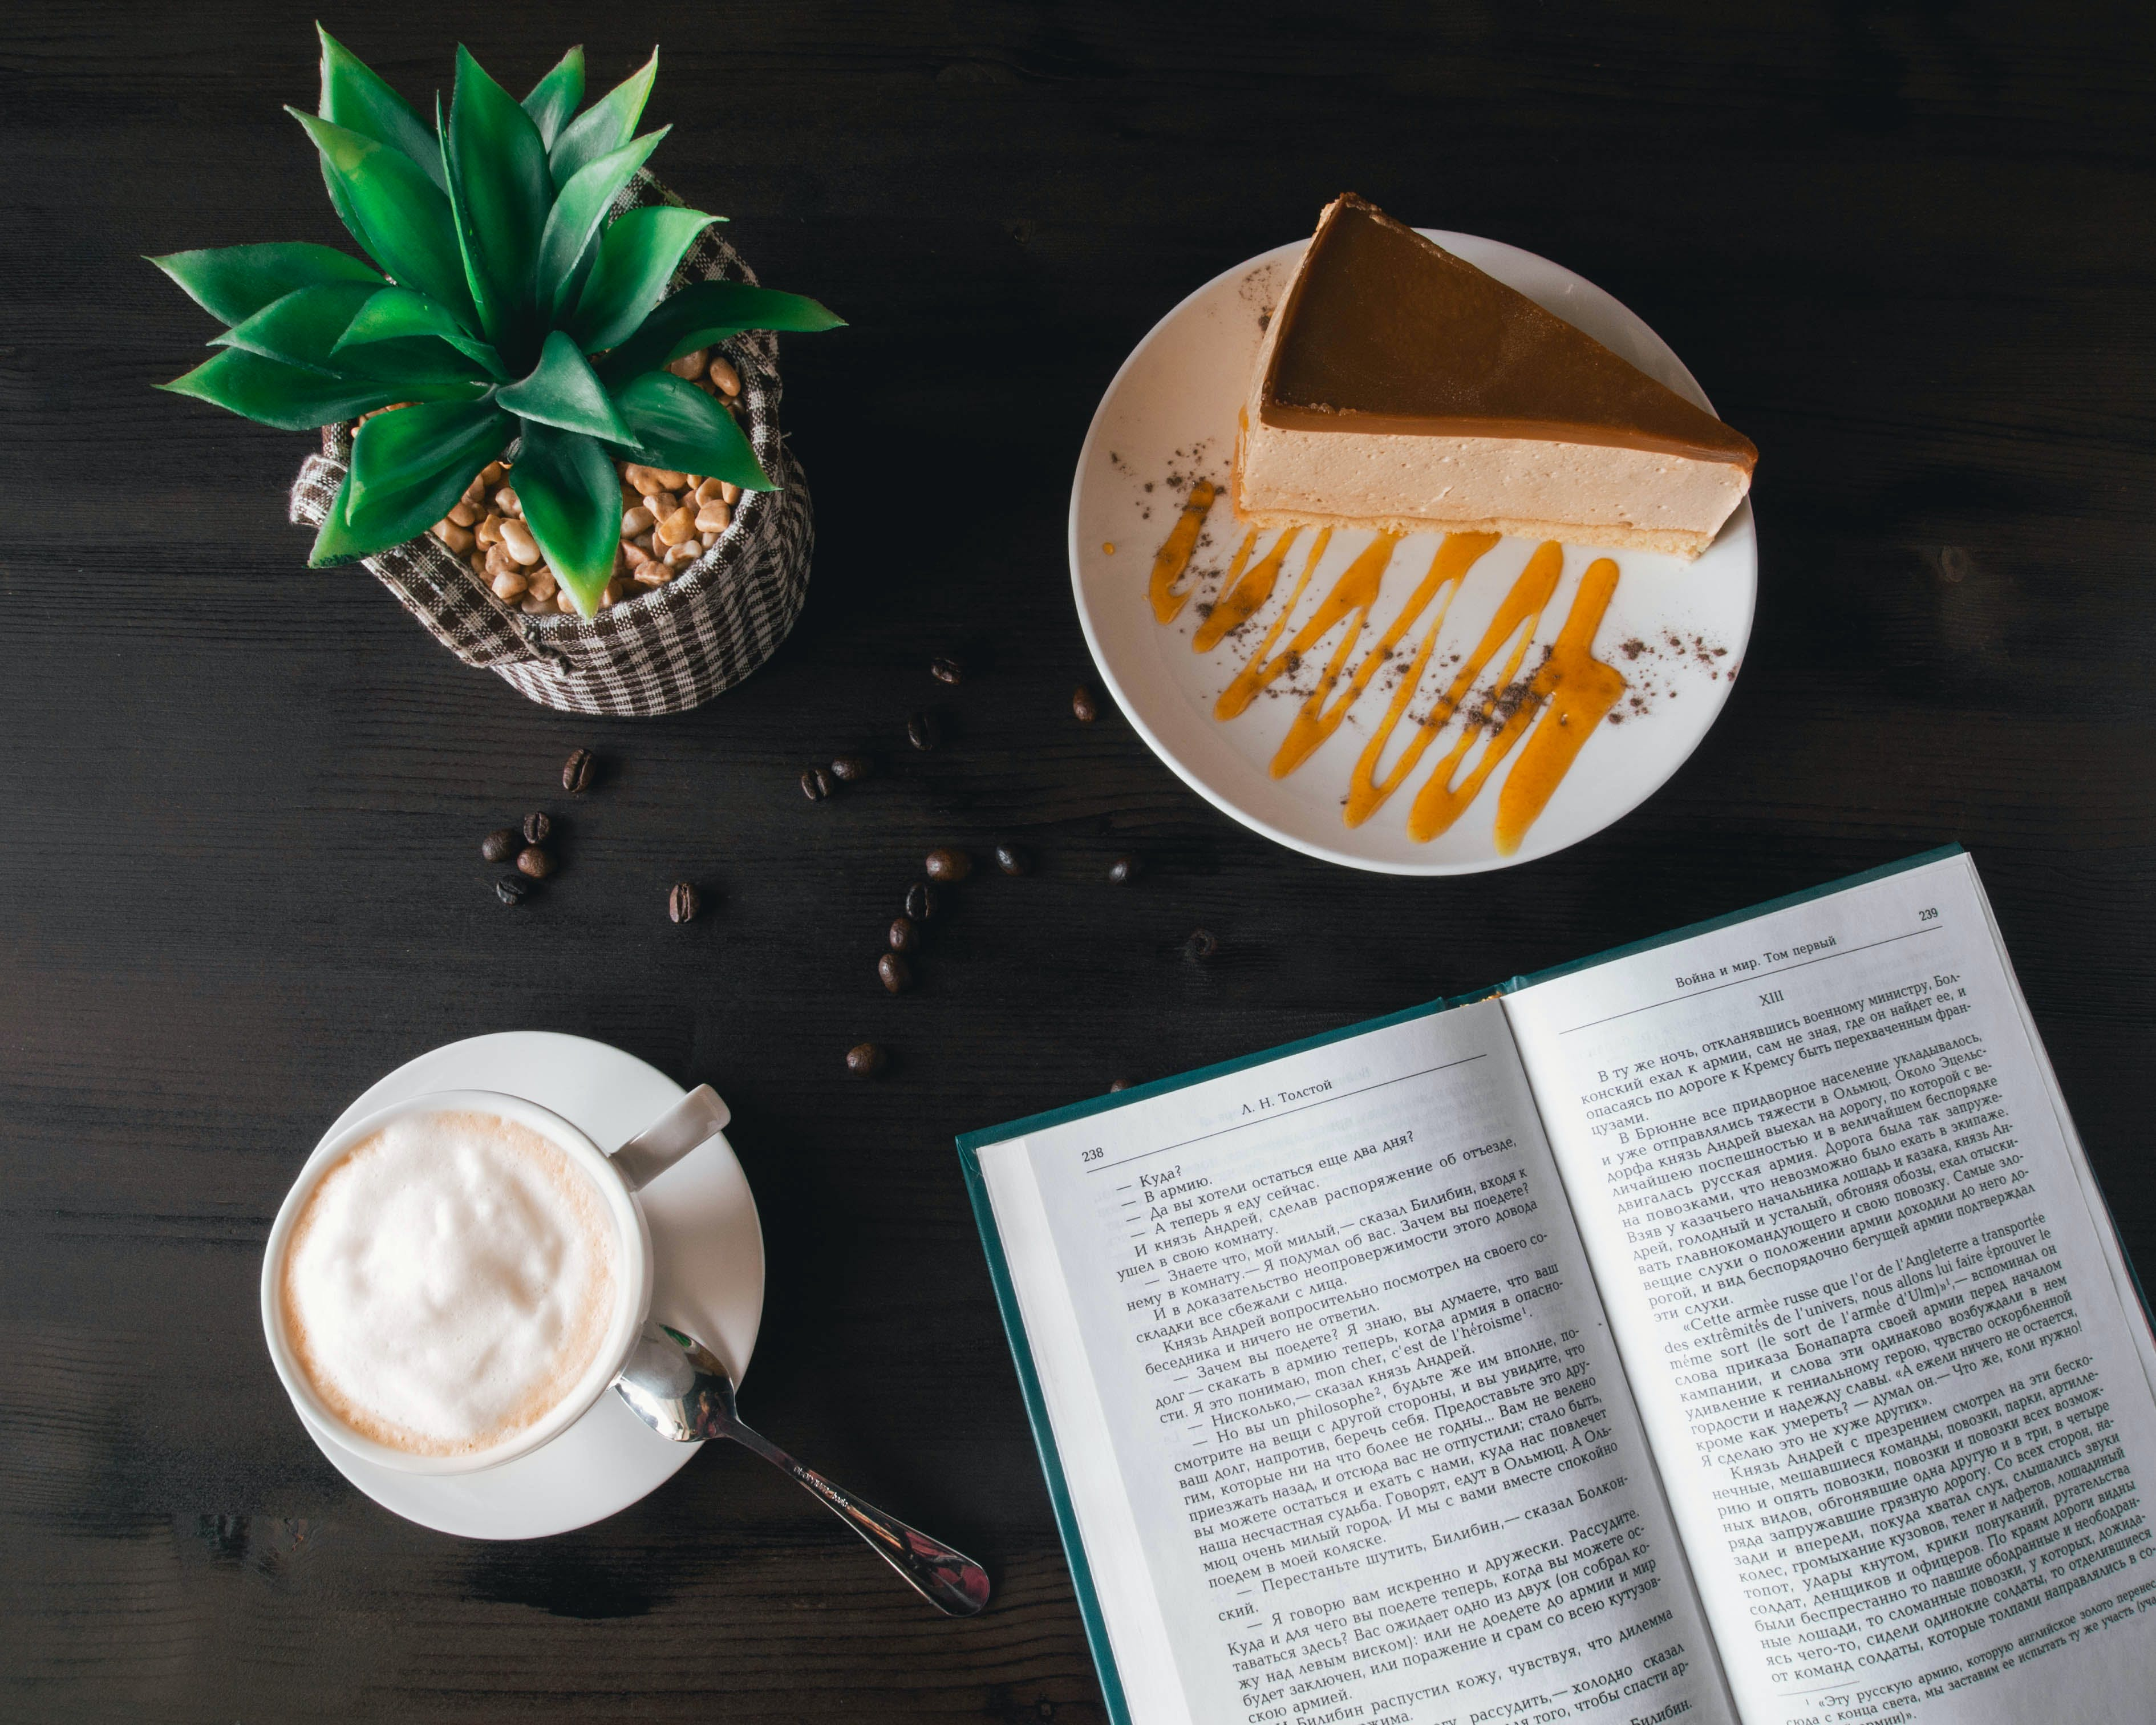 Opened Book Near Custard Cake and Coffee